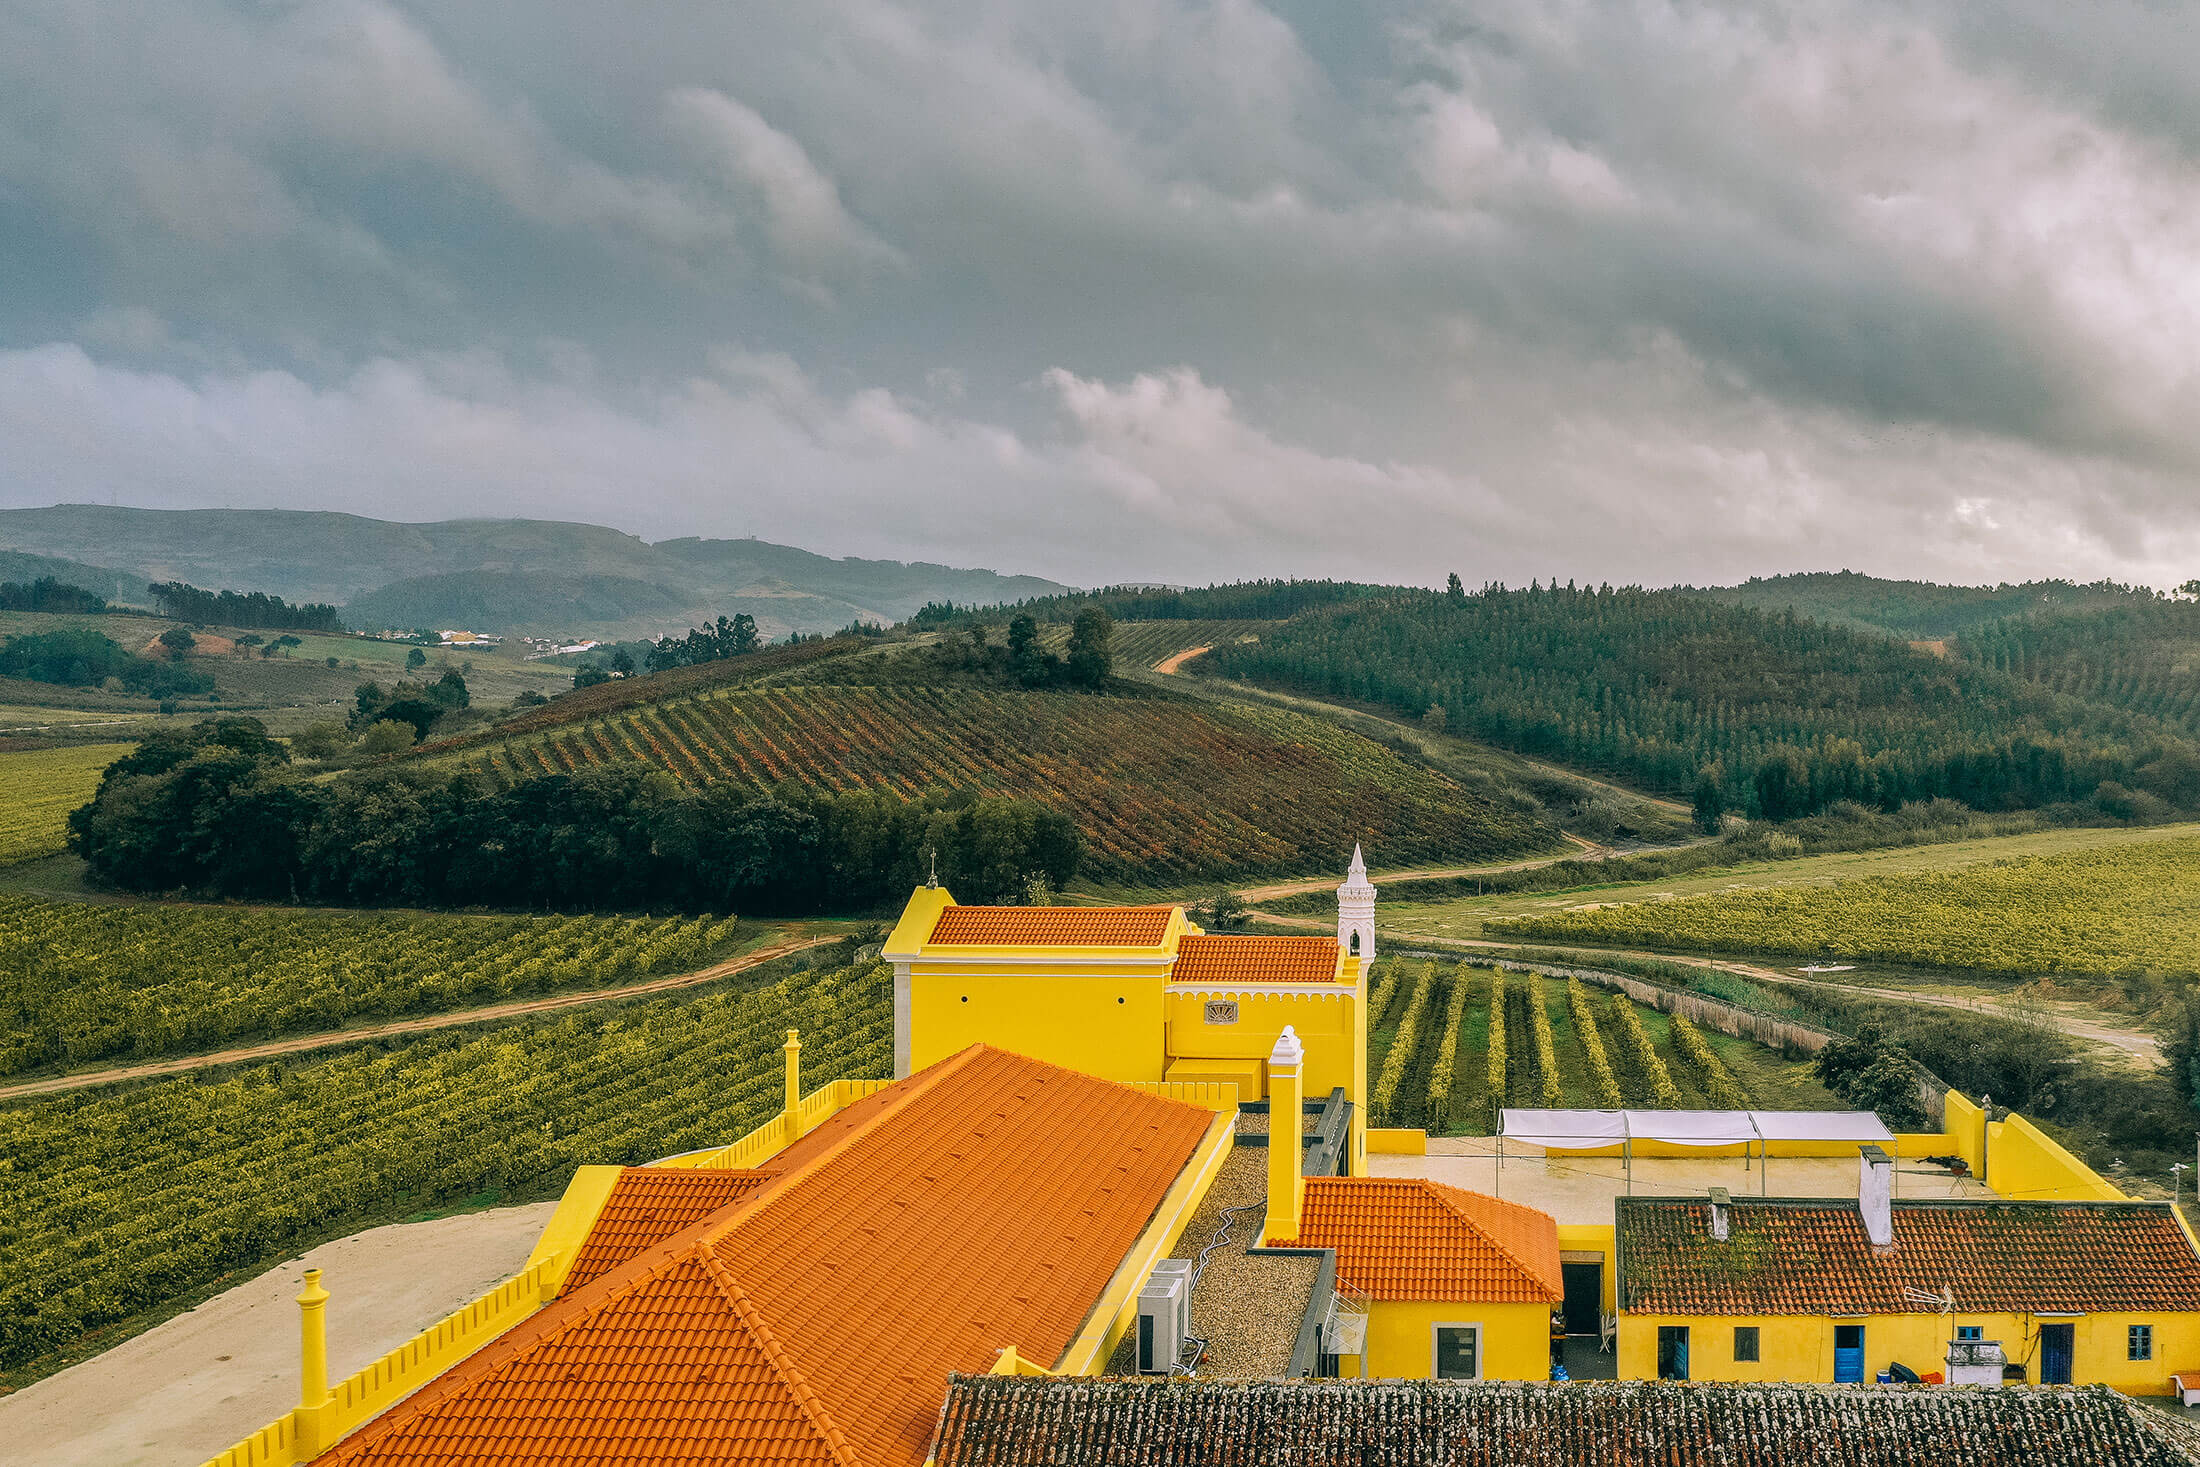 Quinta do Gradil Palace and Vineyards